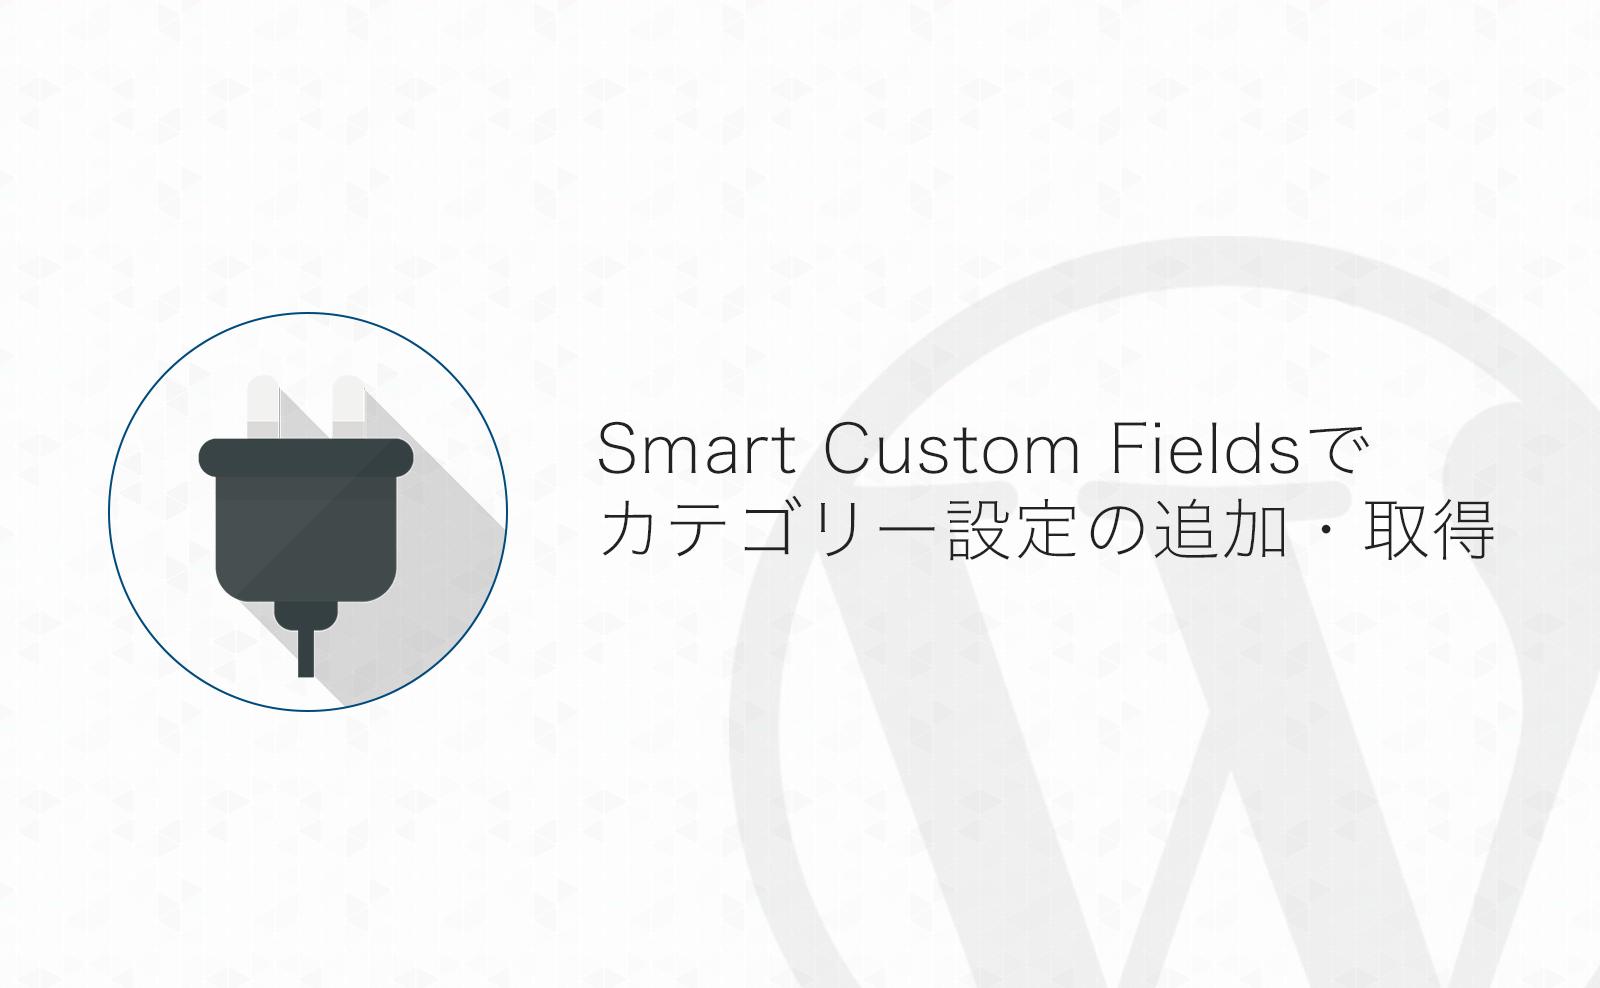 【WordPress】Smart Custom Fieldsでカテゴリー・カスタムタクソノミーに設定を追加する